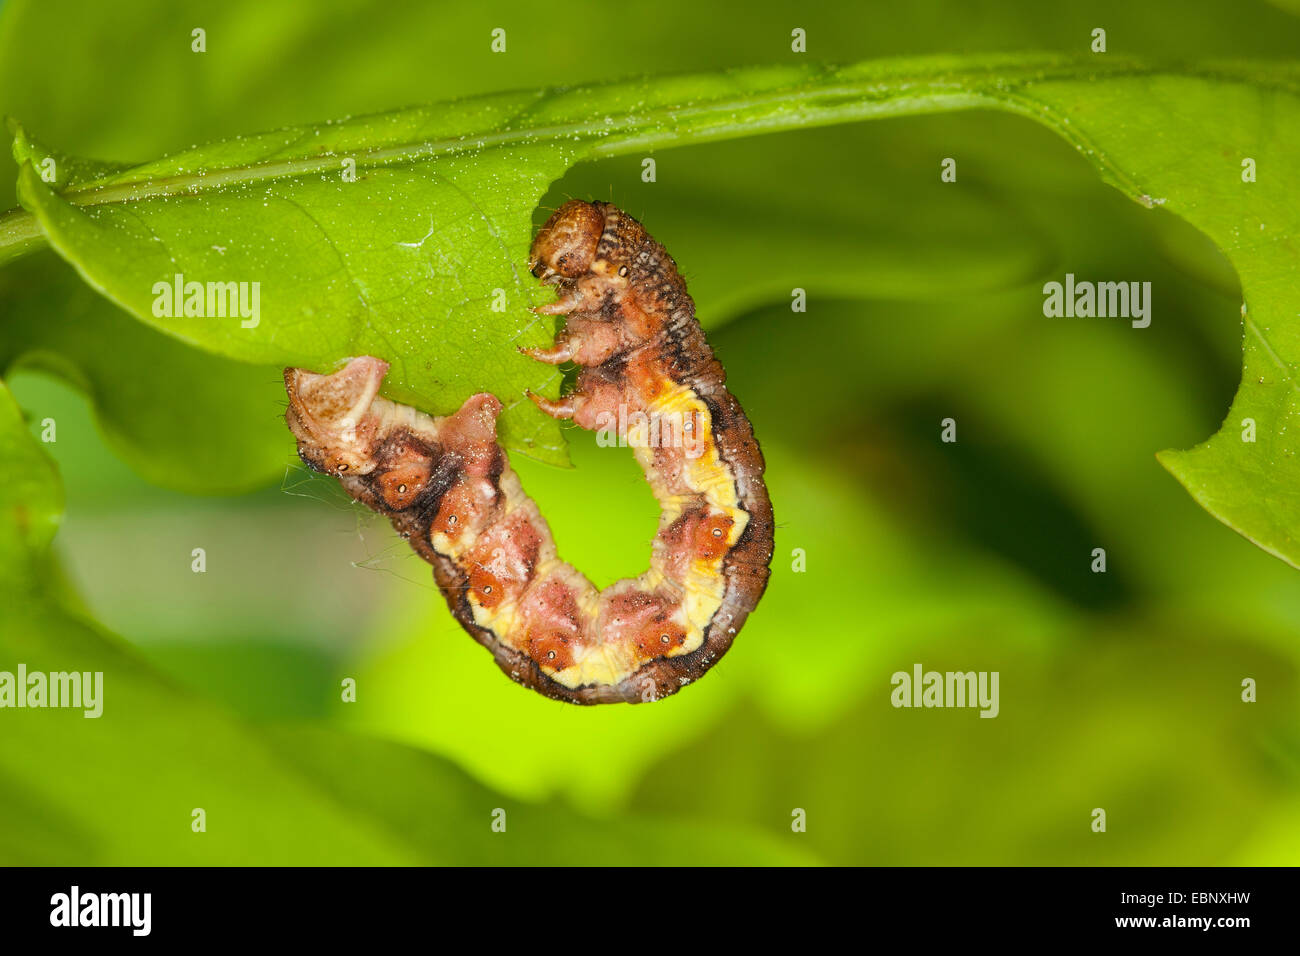 Mottled umber (Erannis defoliaria, Phalaena defoliaria, Hybernia defoliaria), caterpillar feeding on oak leaf, forest - Stock Image